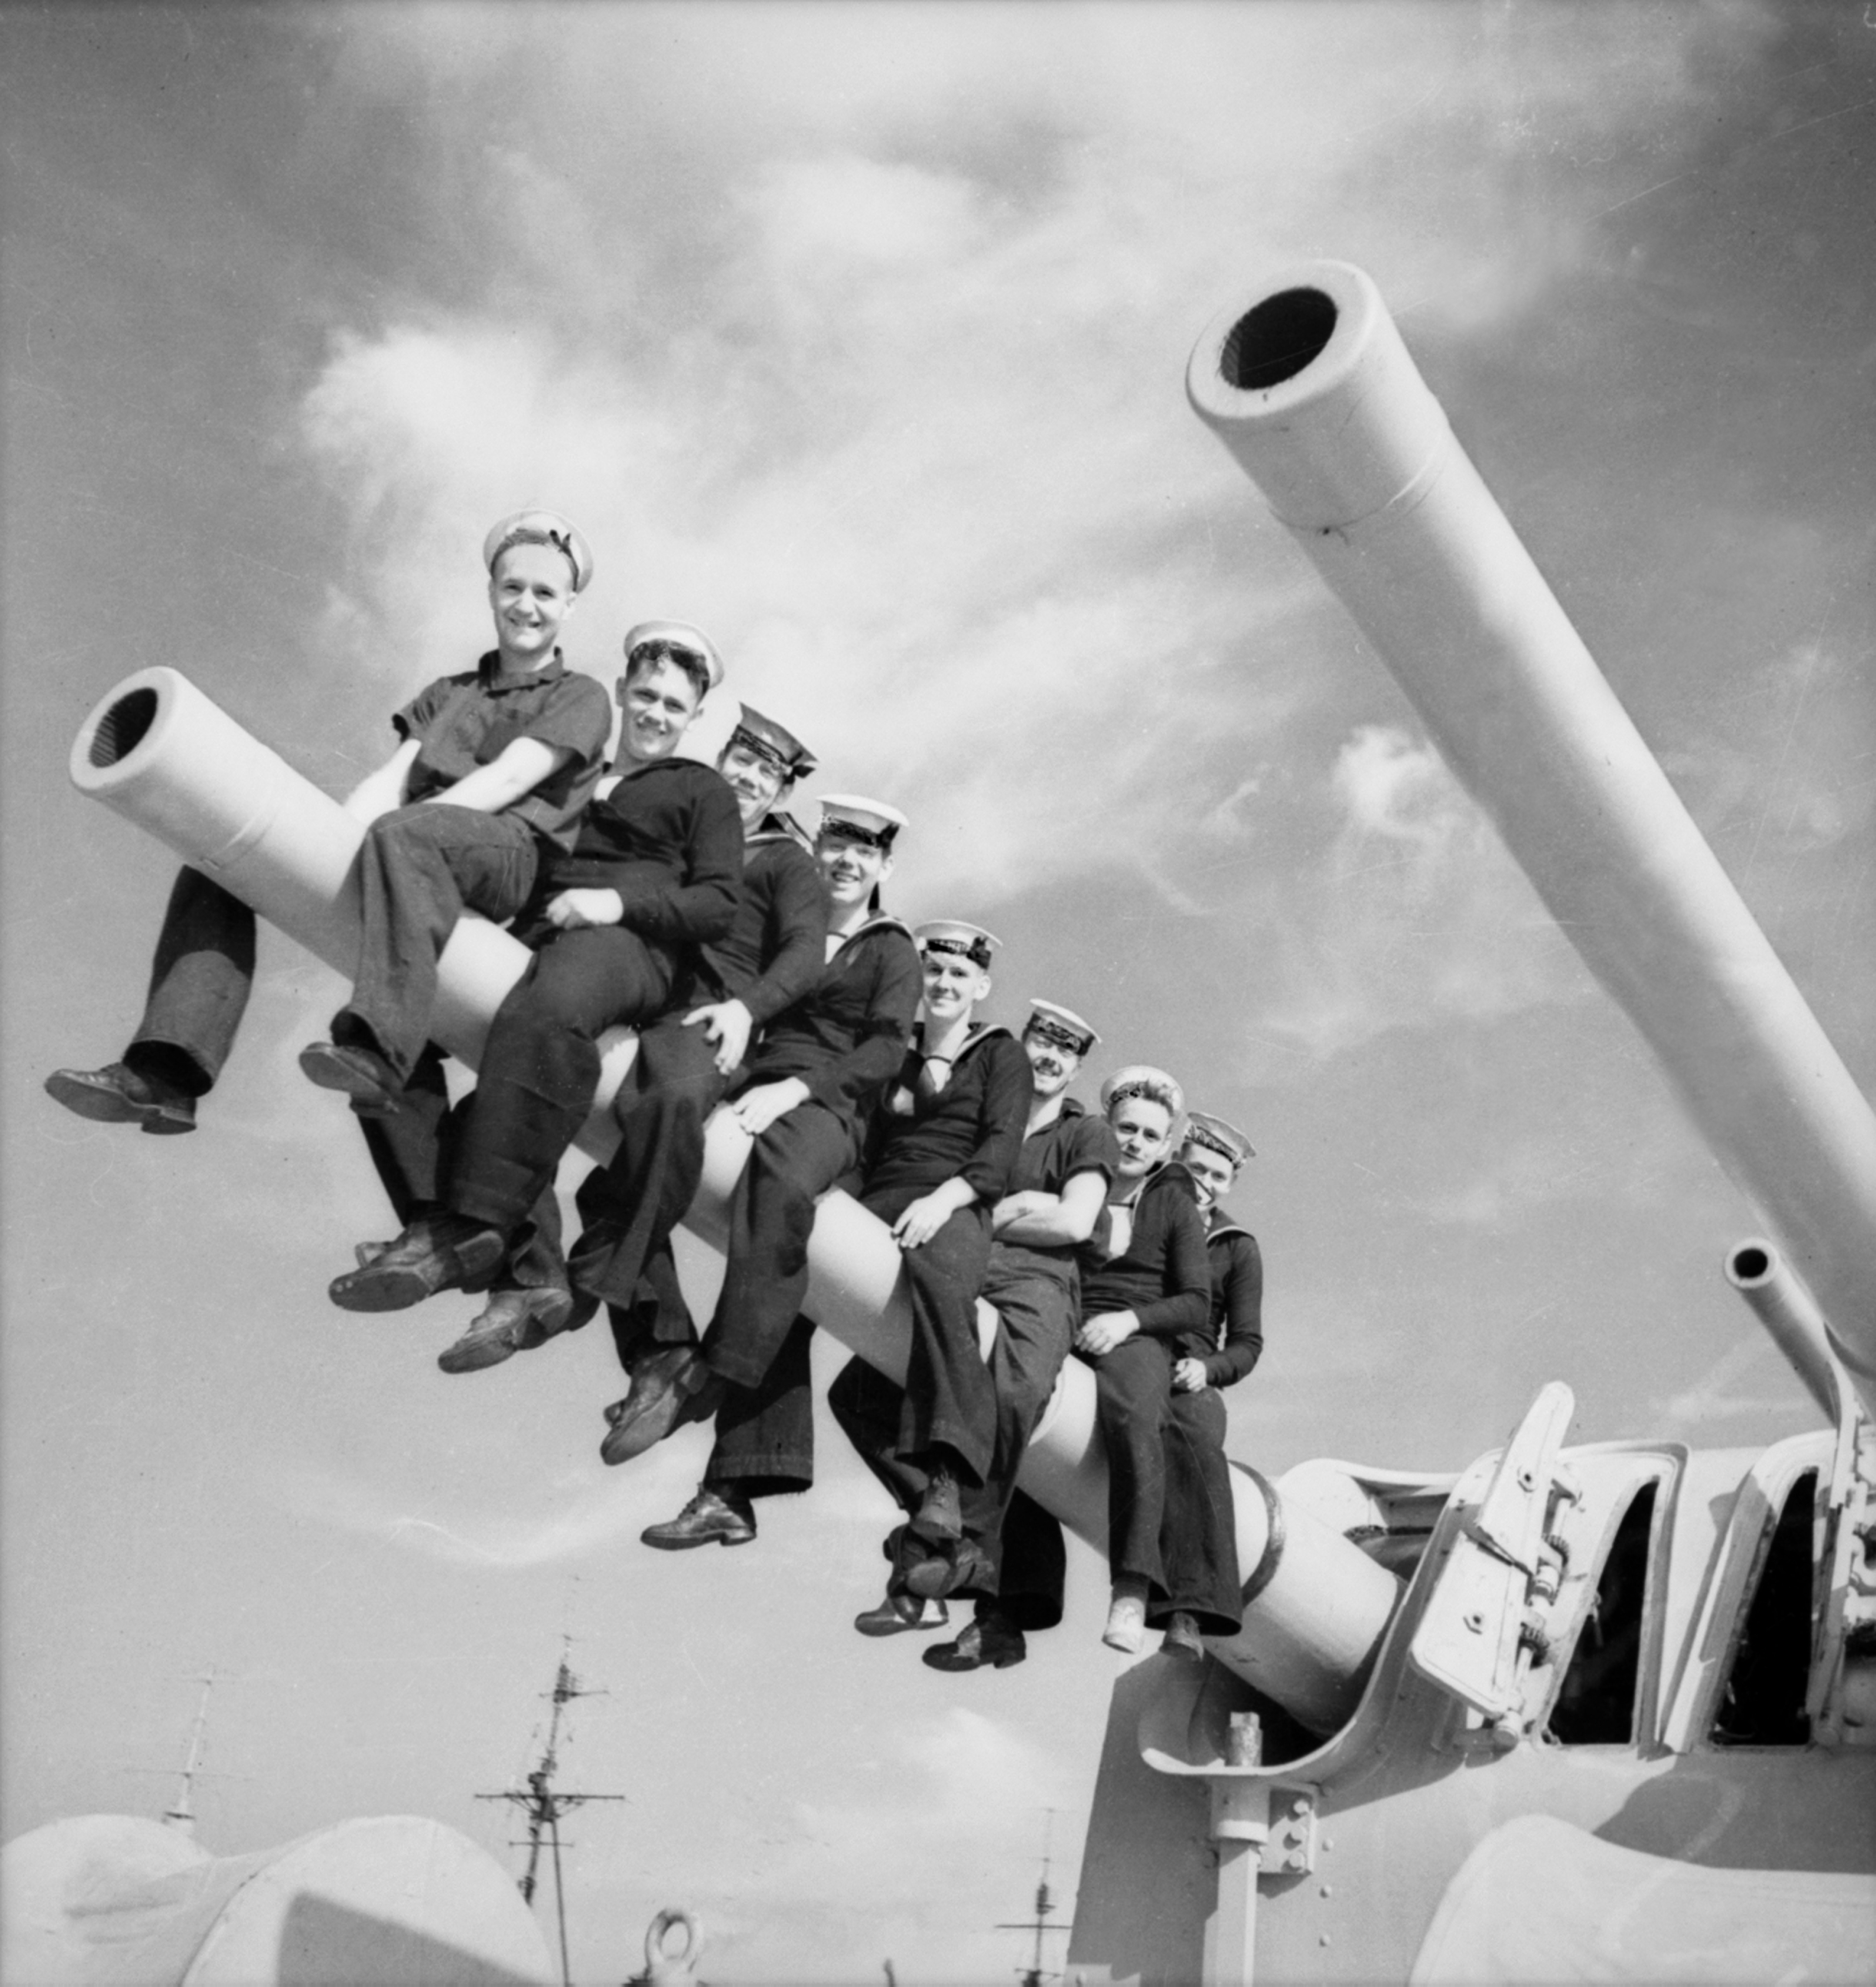 HMAS_Perth_-_men_astride_gun_turret,_194